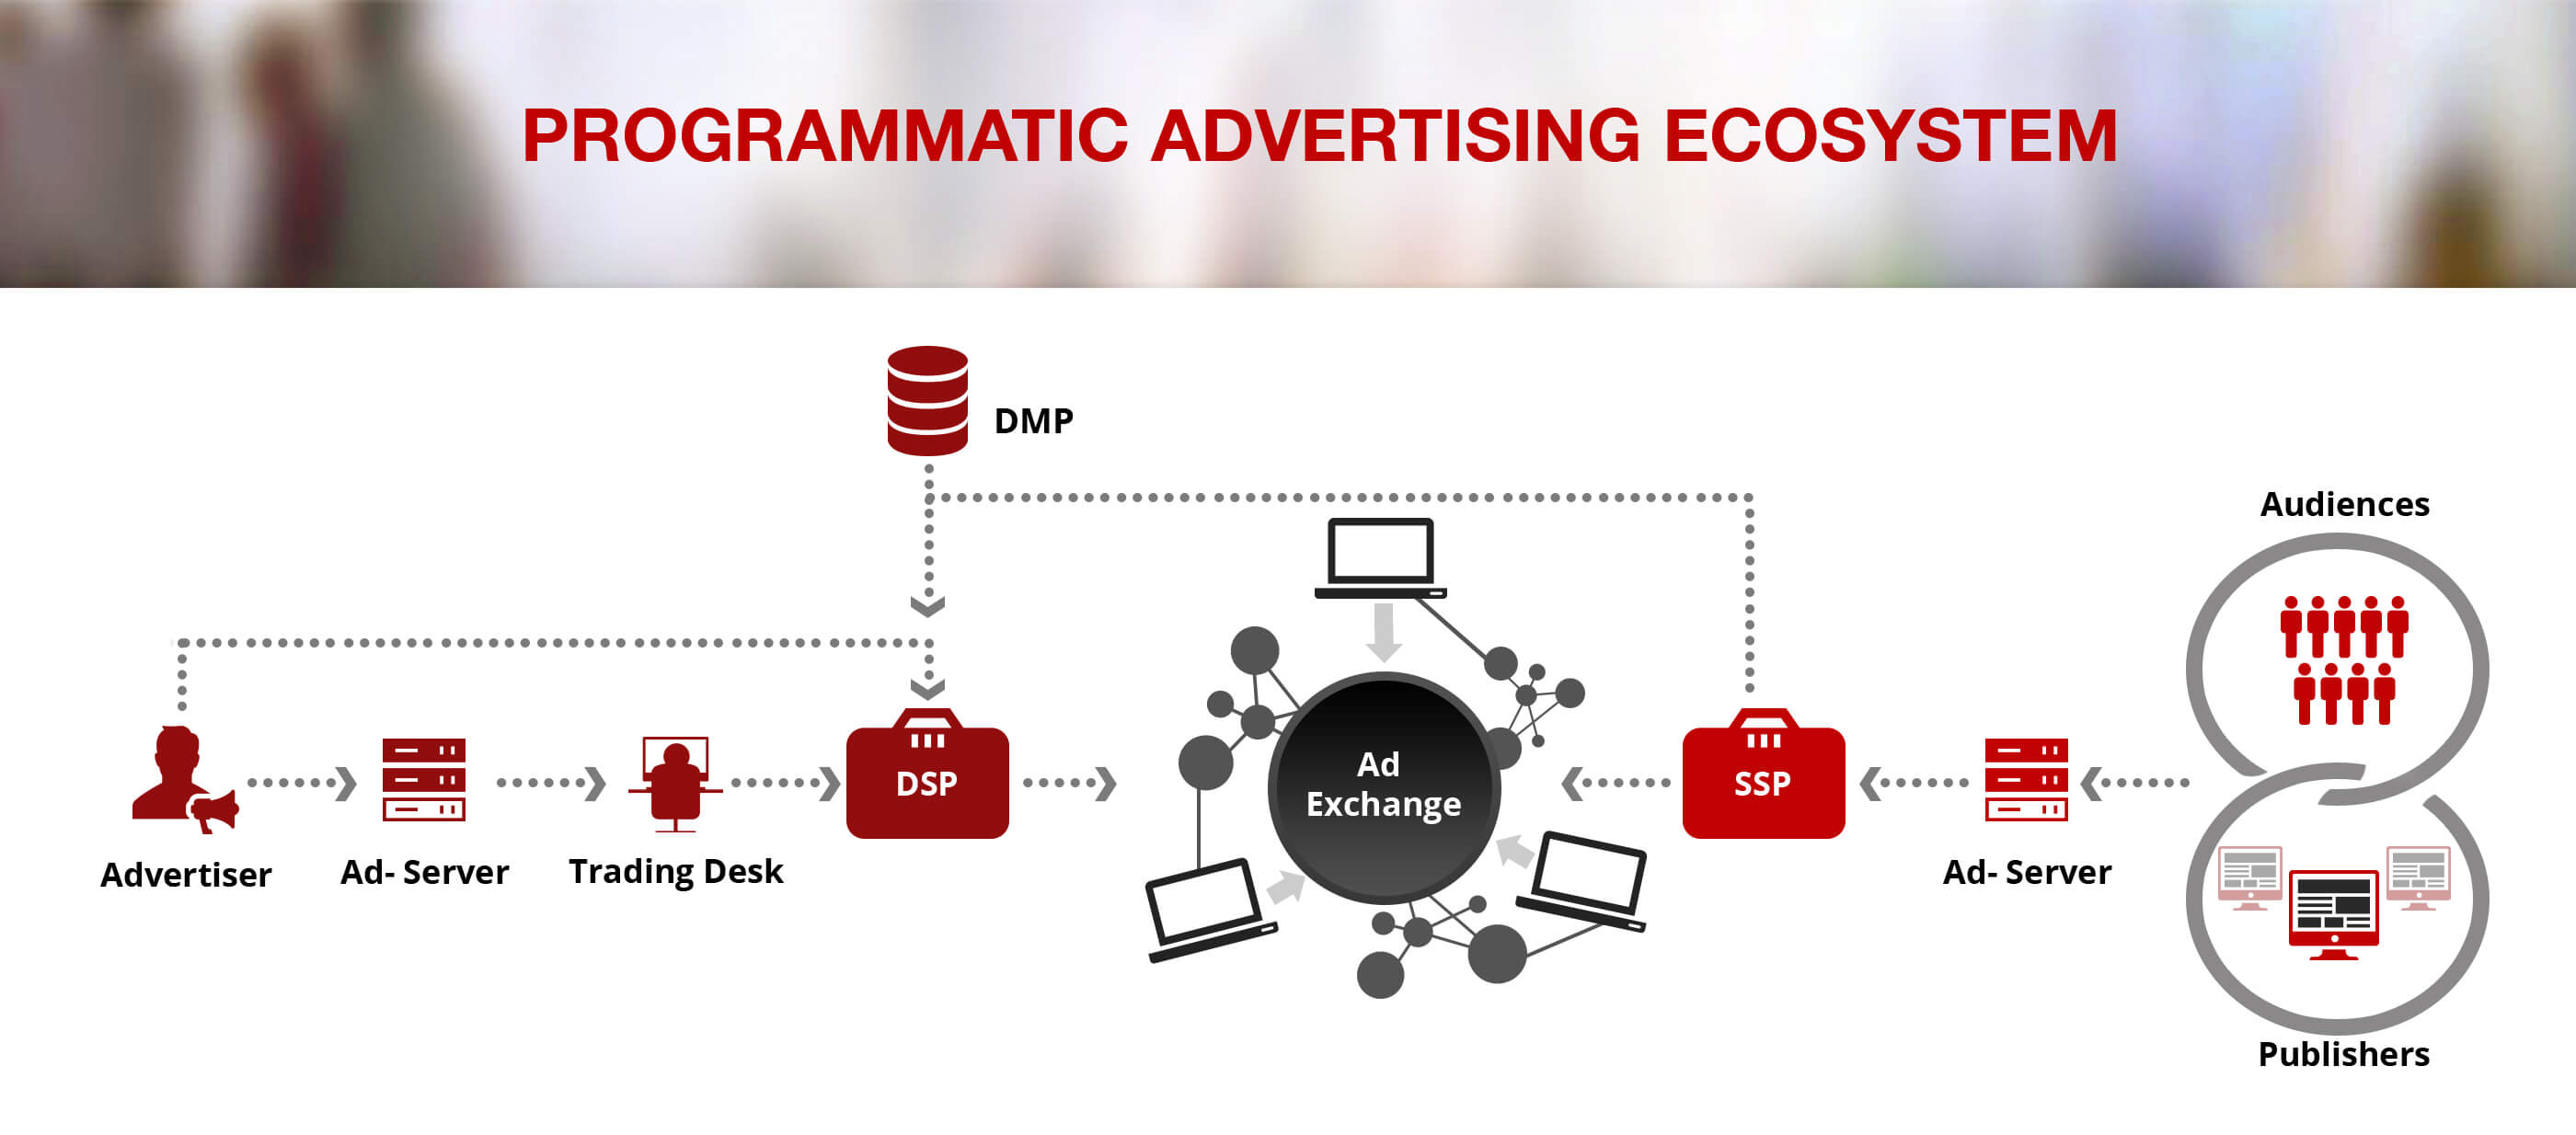 Programmatic Advertising Ecosystem